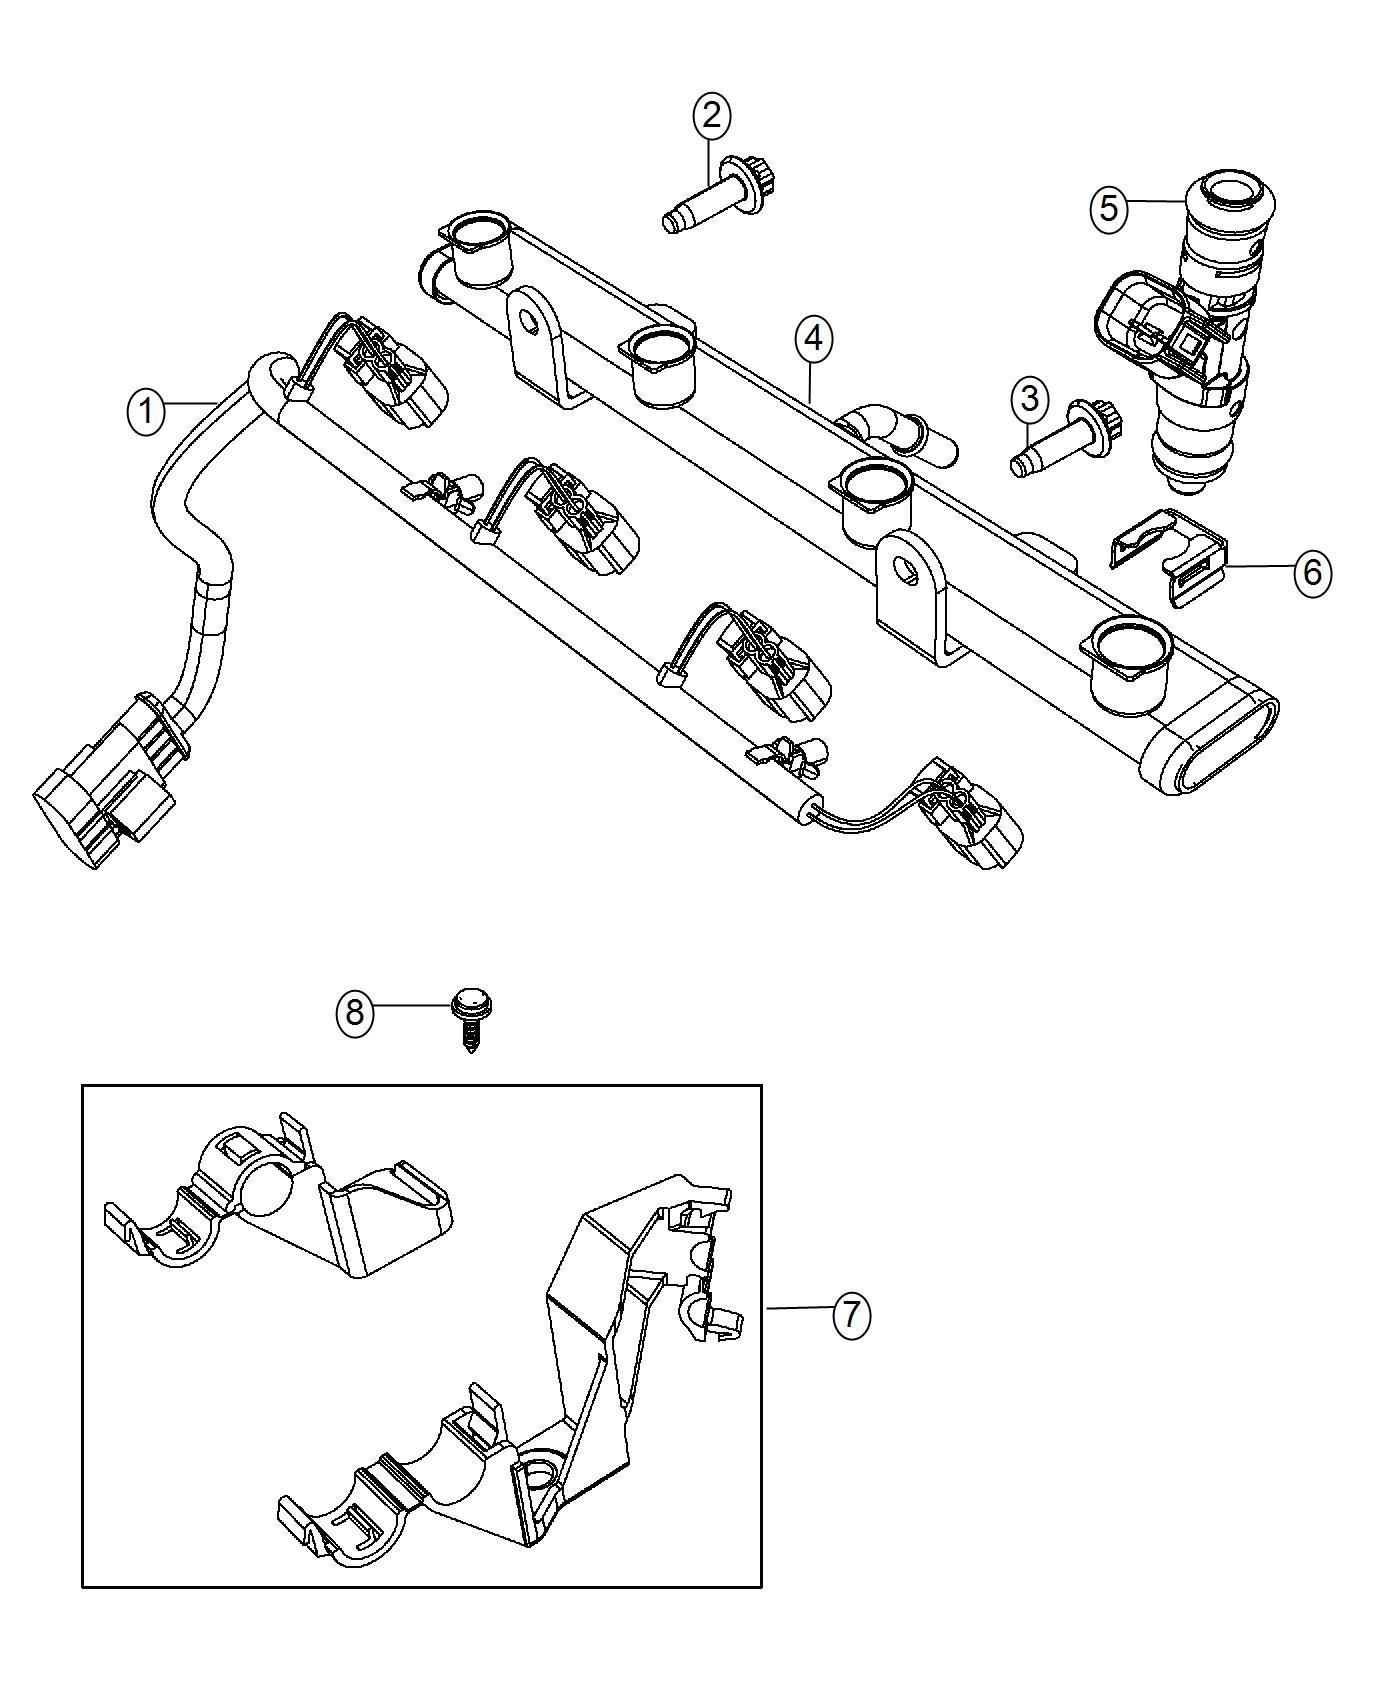 Fiat 500 Wiring. Fuel rail, injector. Turbo, engine